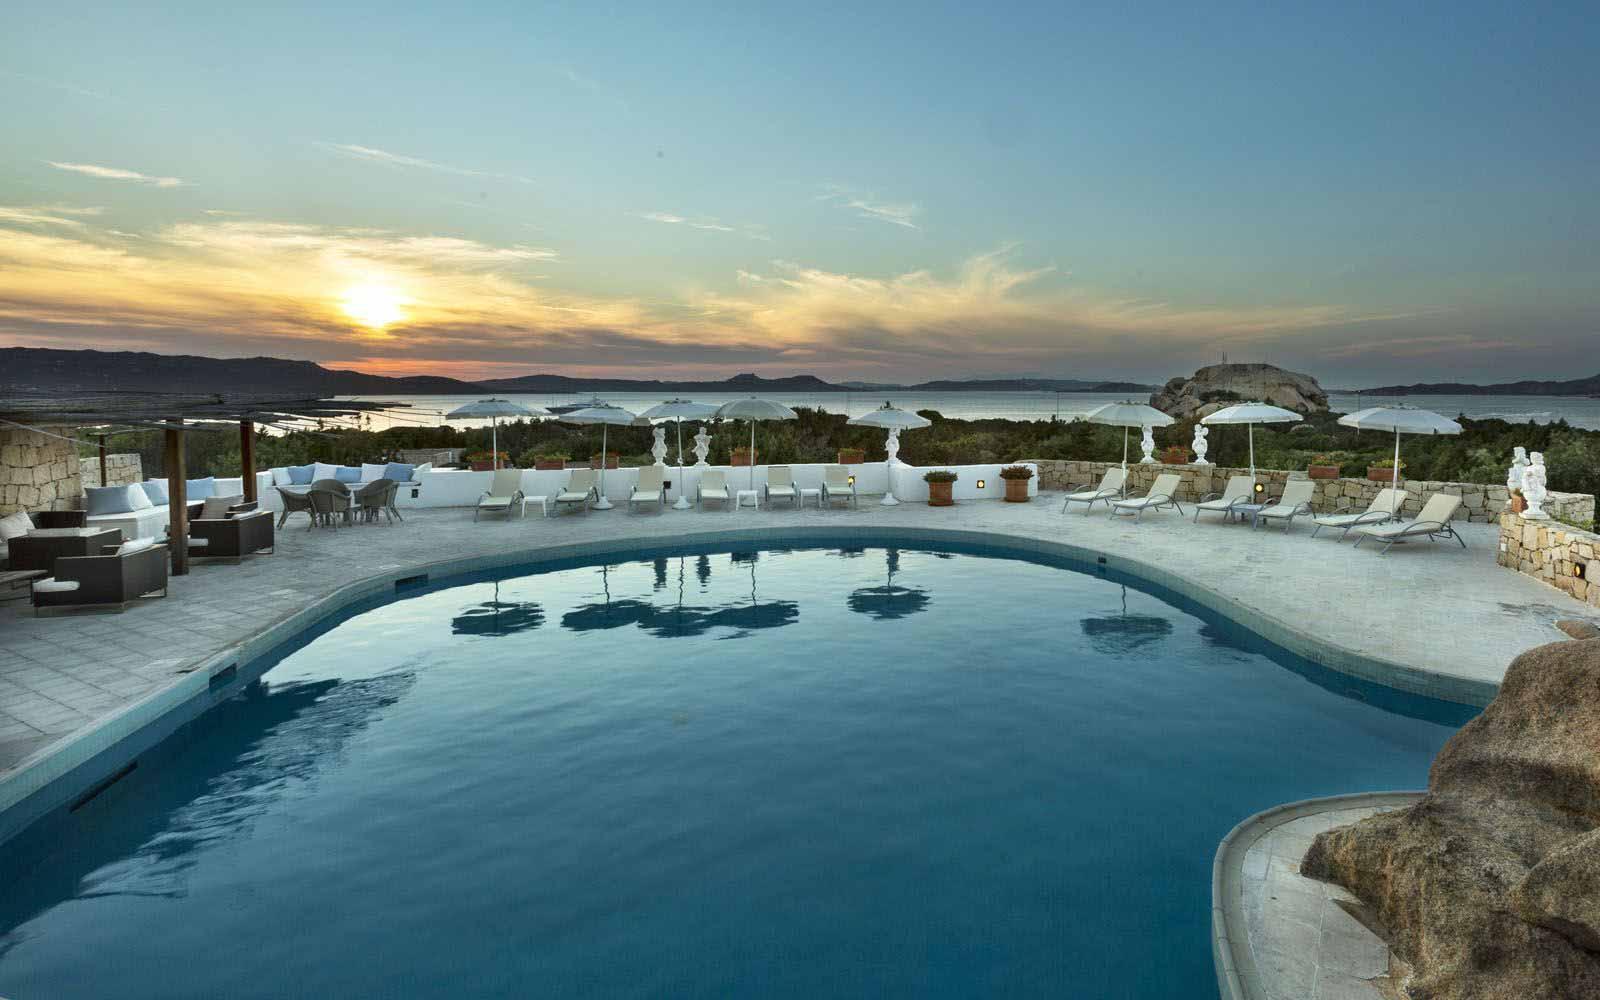 Grand Relais dei Nuraghi's swimming pool in the evening